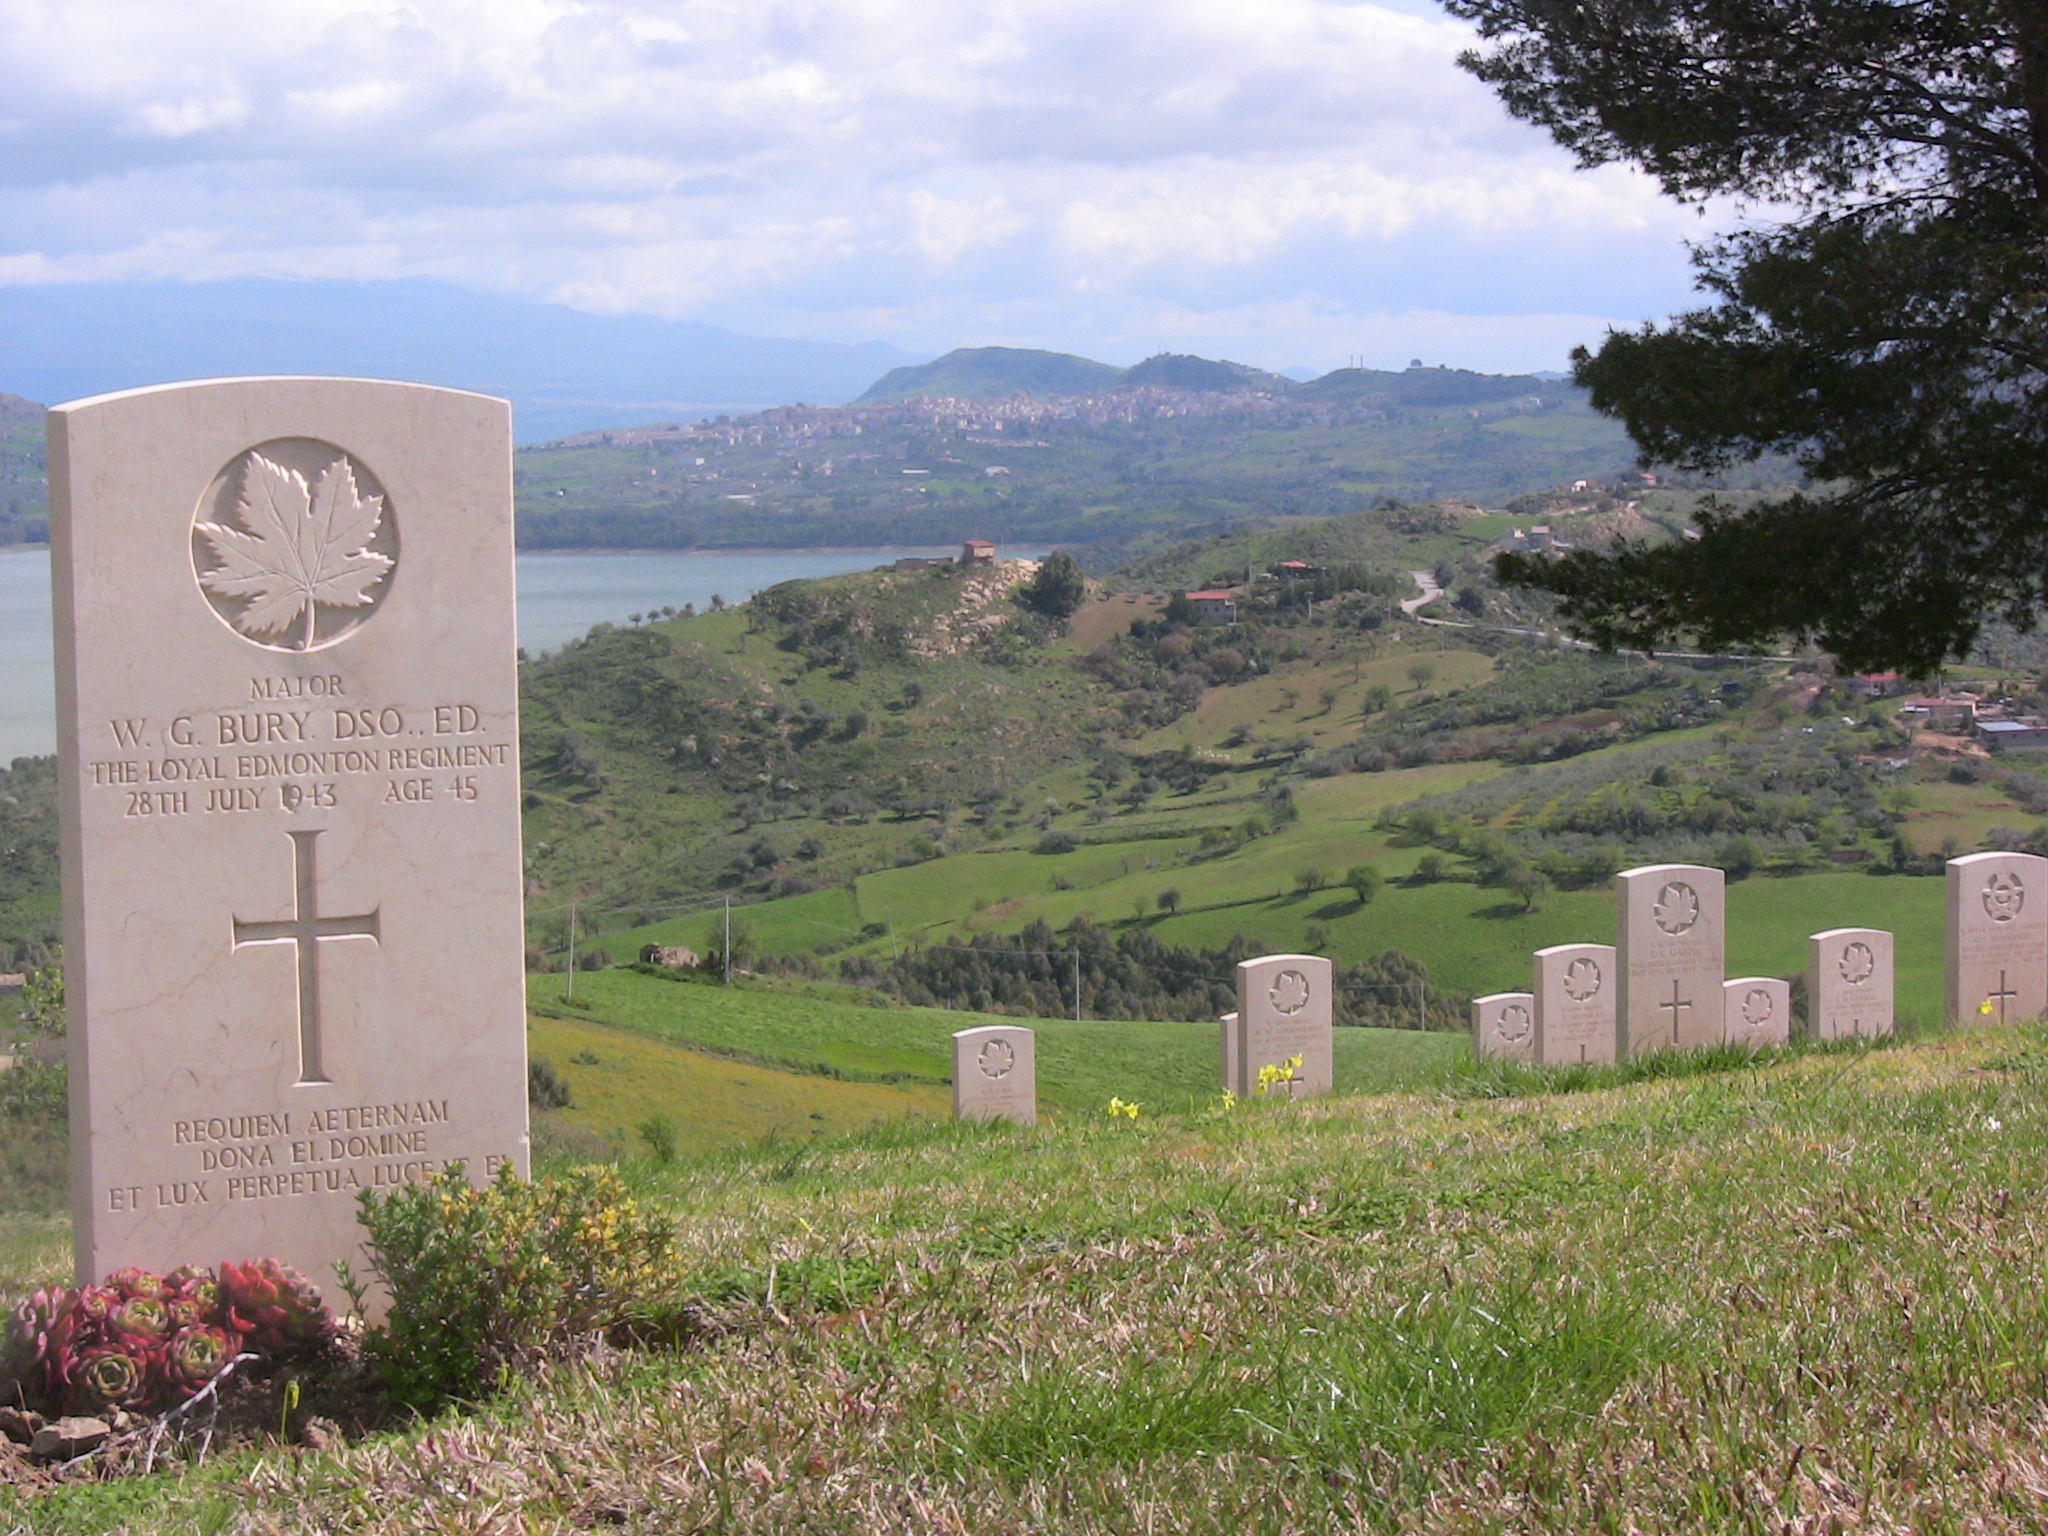 Grave Marker– W.G. Bury DSO - Grave Marker